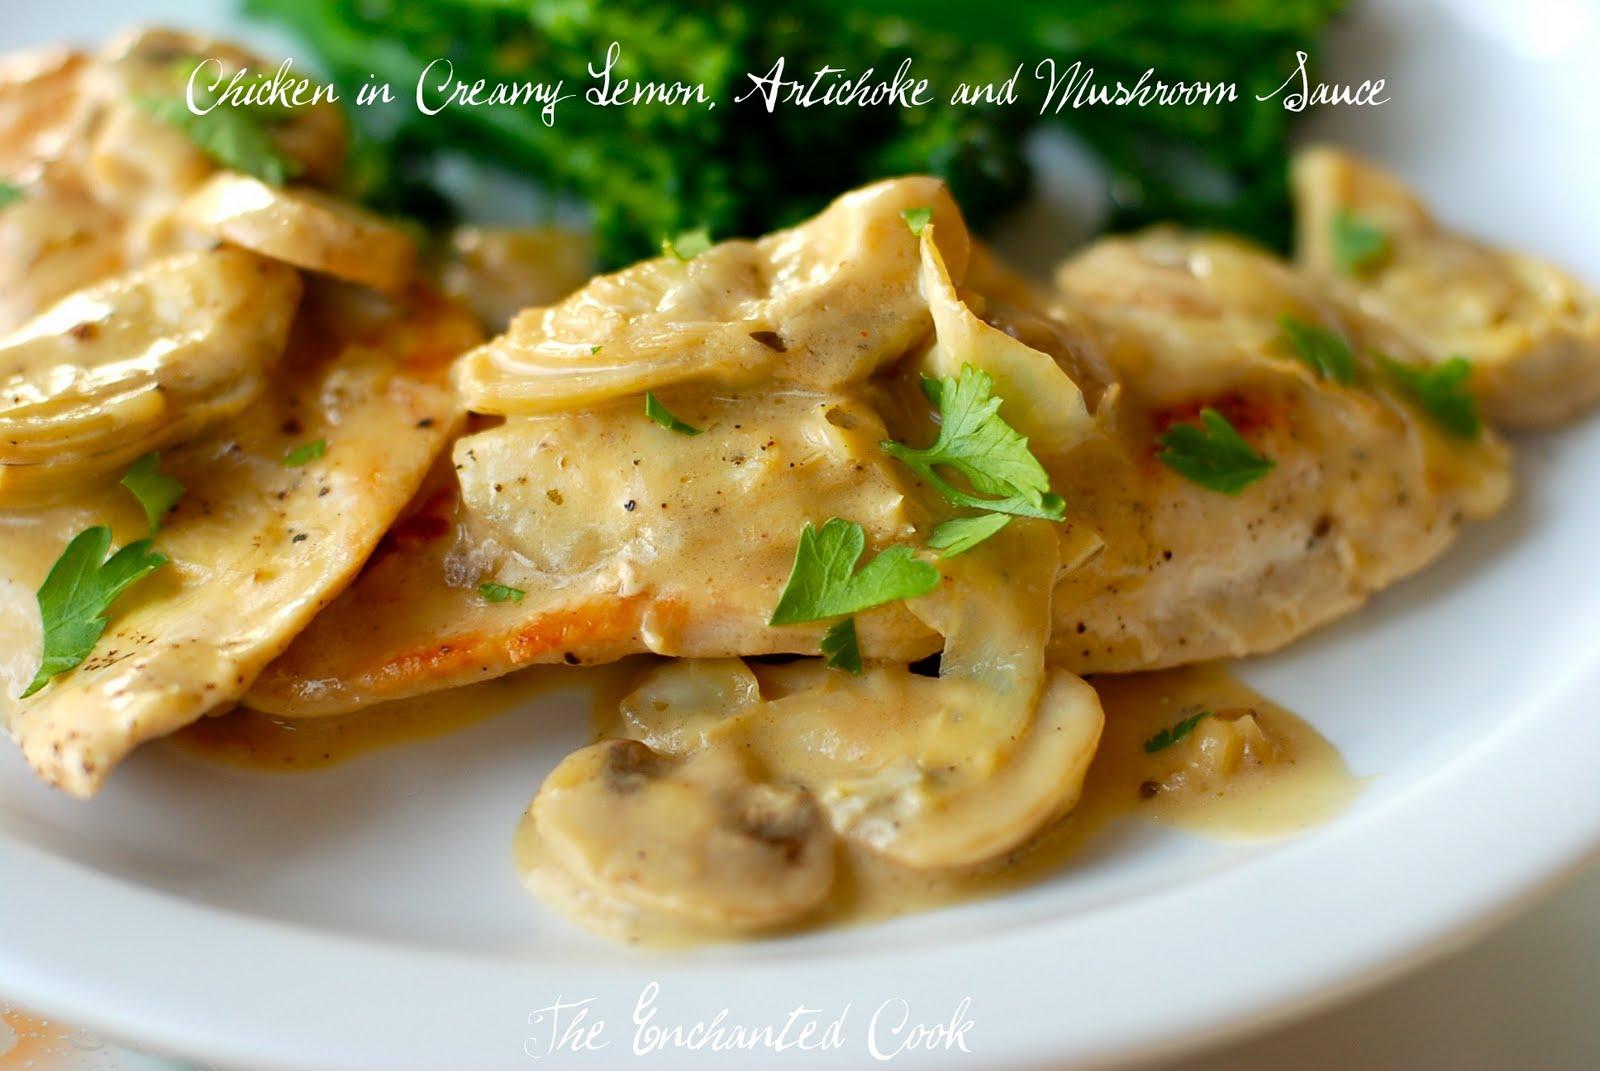 ... Enchanted Cook: Chicken in Creamy Lemon, Artichoke and Mushroom Sauce